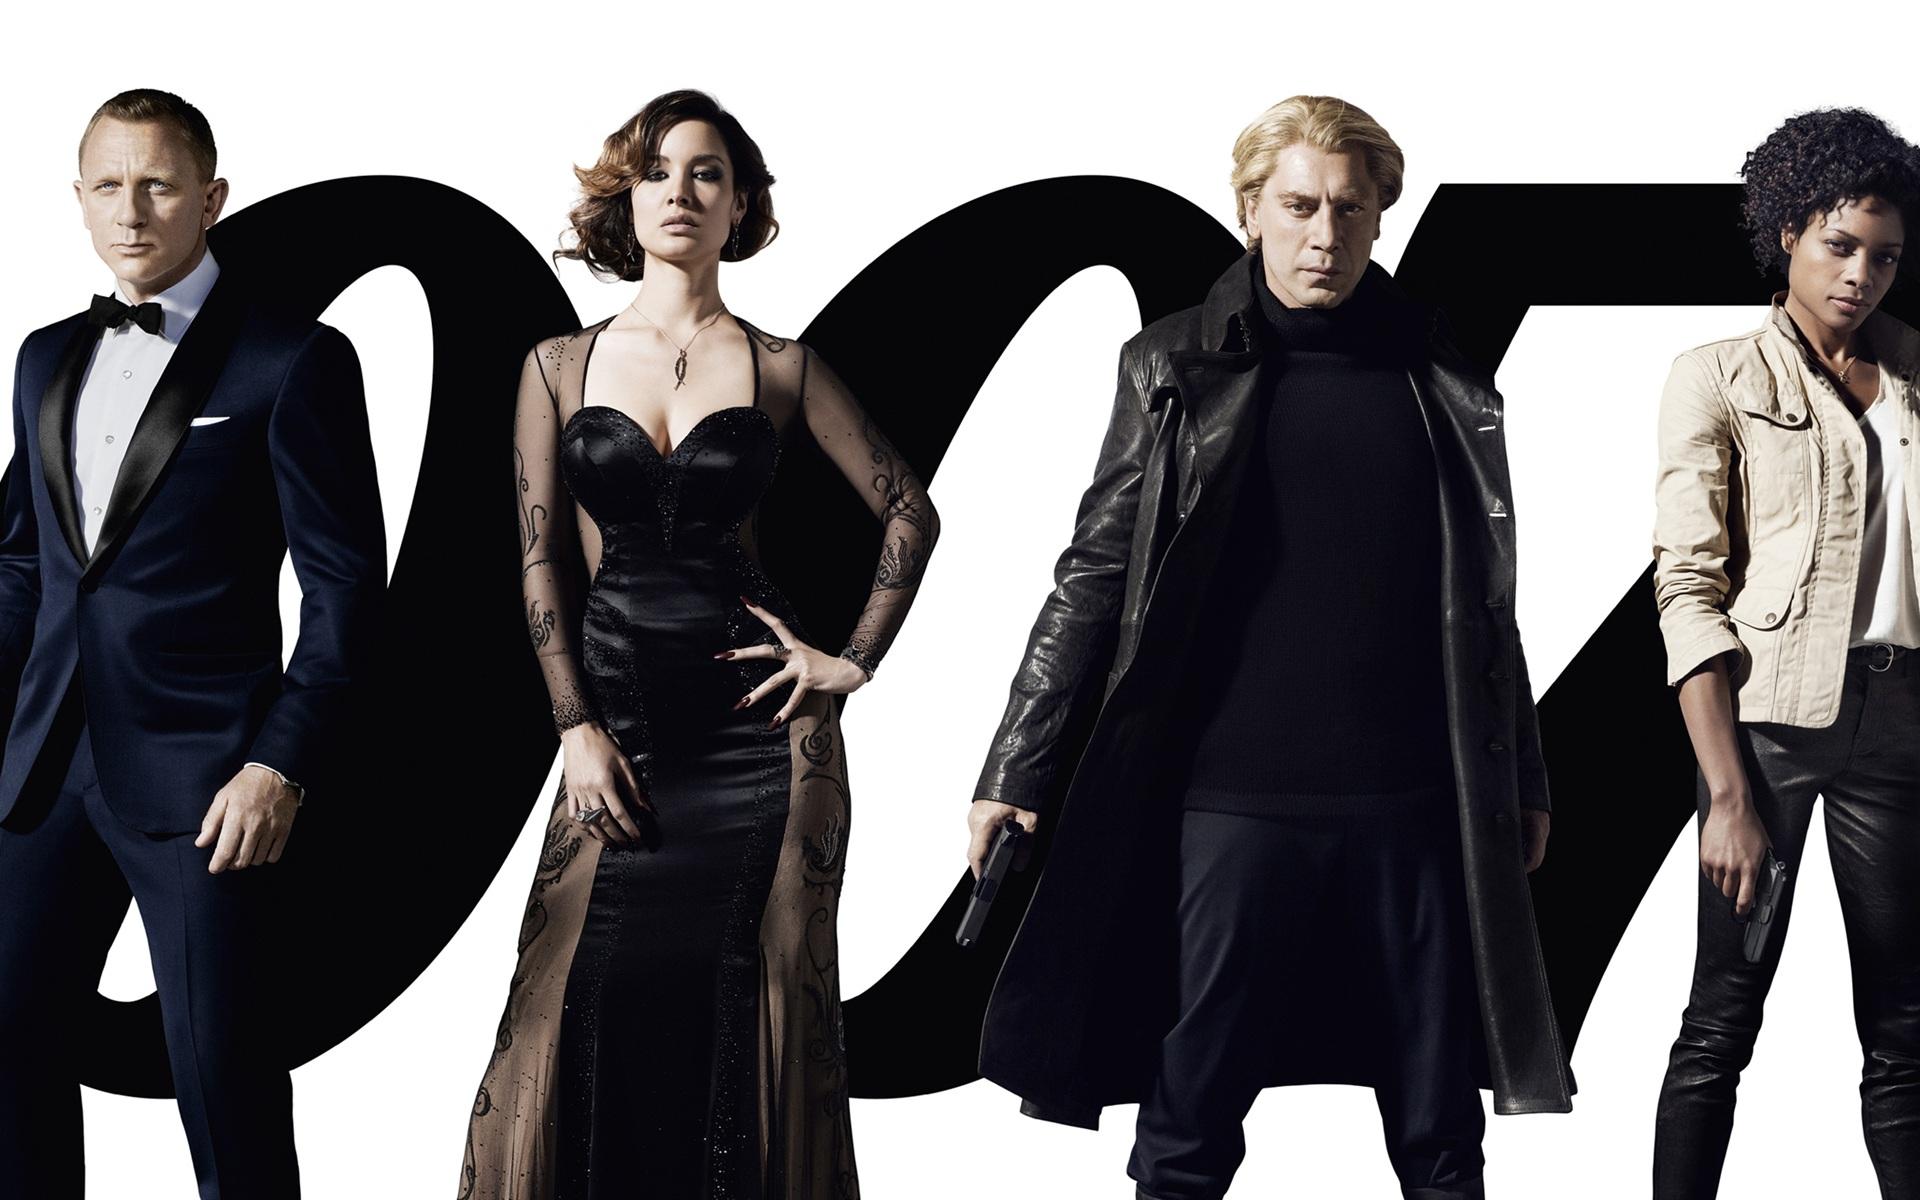 007-Skyfall-movie-HD_1920x1200.jpg